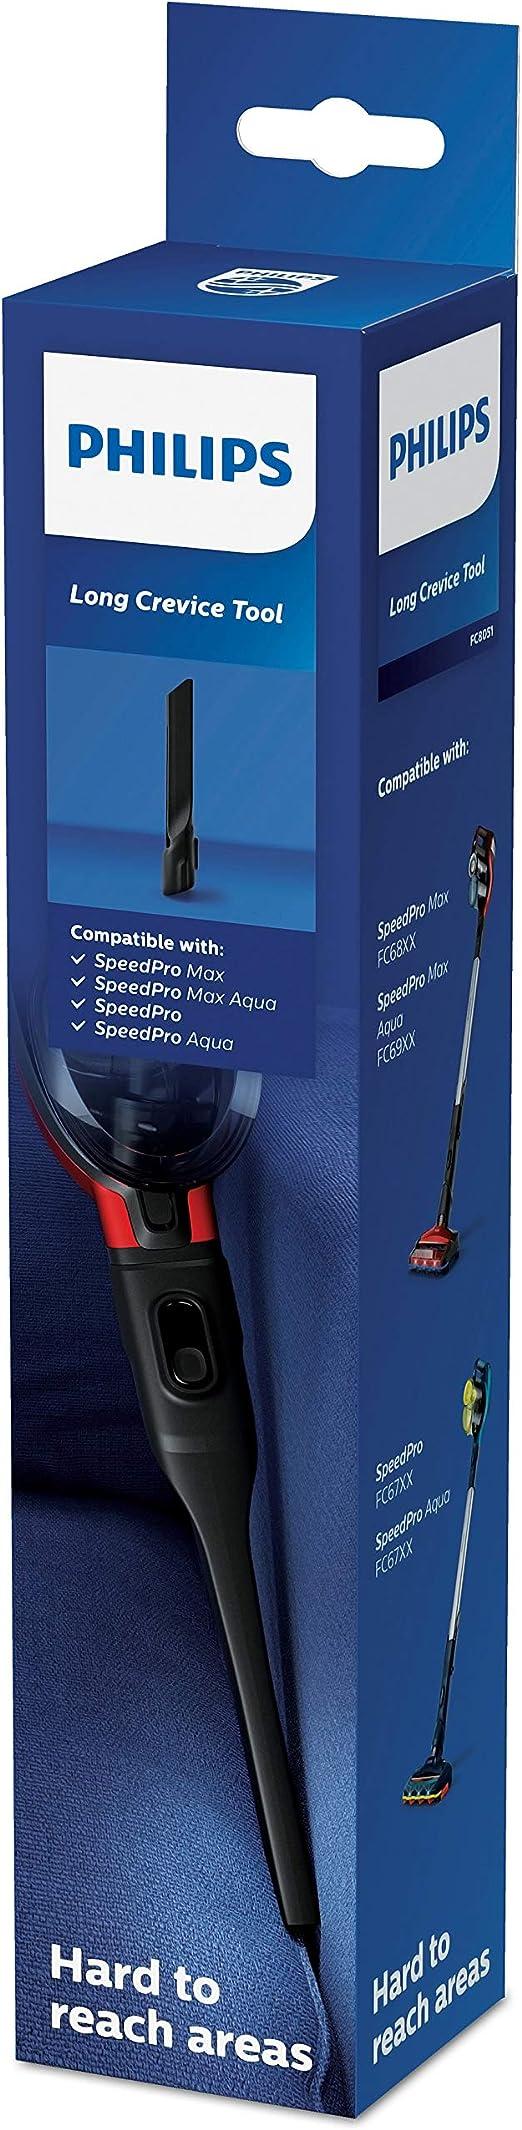 FC6812 FC6813 FC6822 FC6823 FC6826 FC6901 FC6902 FC6903 FC6904 Philips FC5005//01 vacuum accessory//supply Stick vacuum Accessory kit FC5005//01 Accessory kit Black Stick vacuum